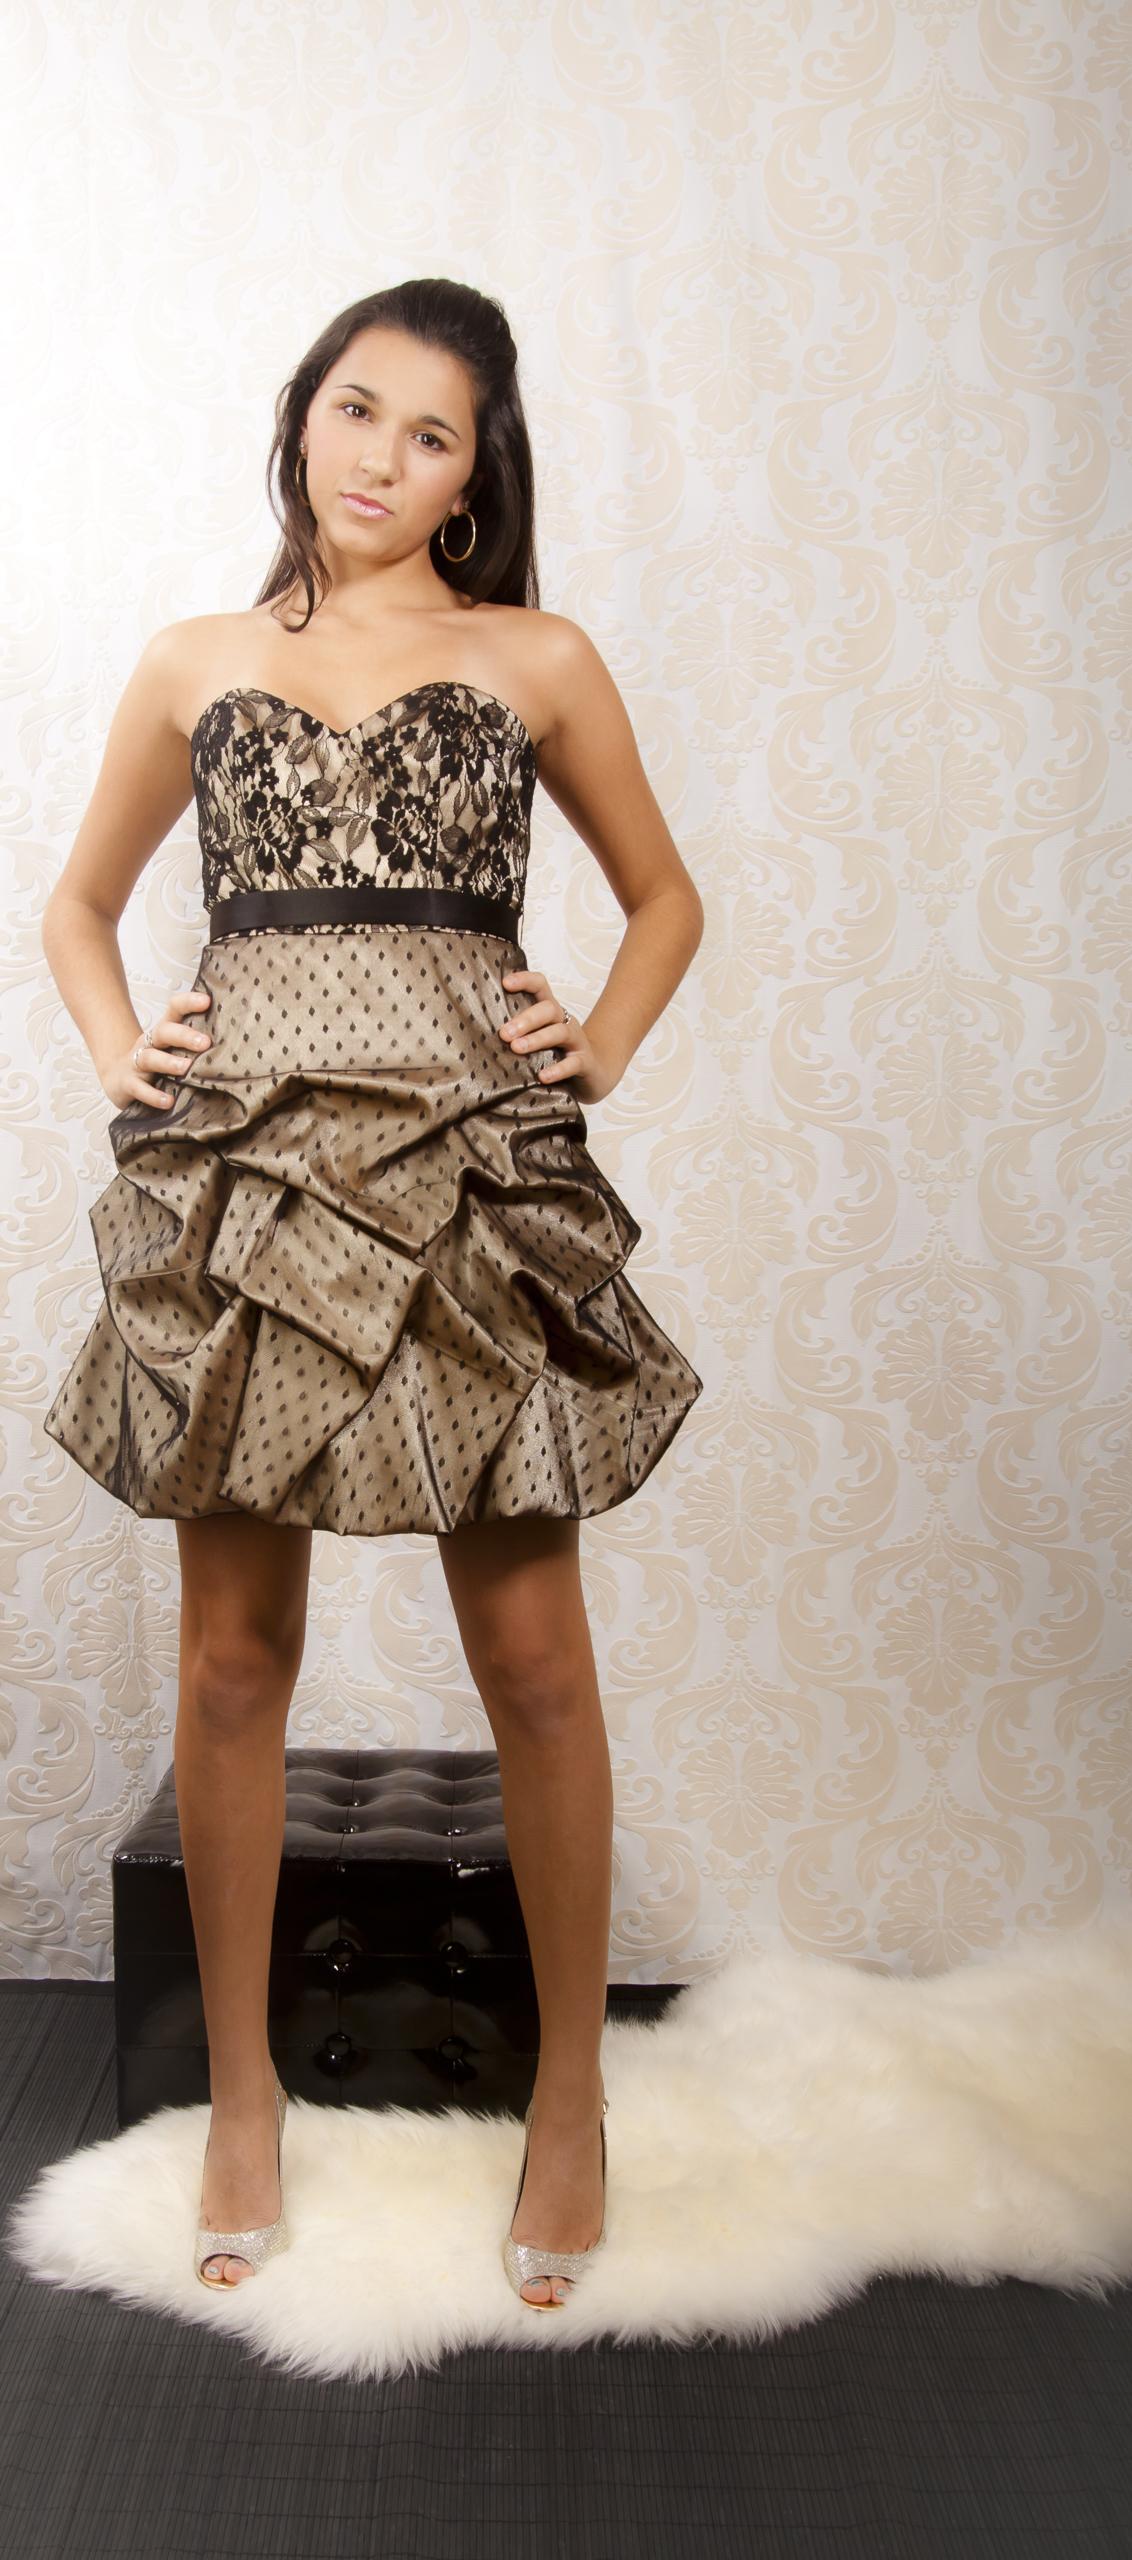 07 modern styled senior portrait session prom dress fur rug 8811.jpg